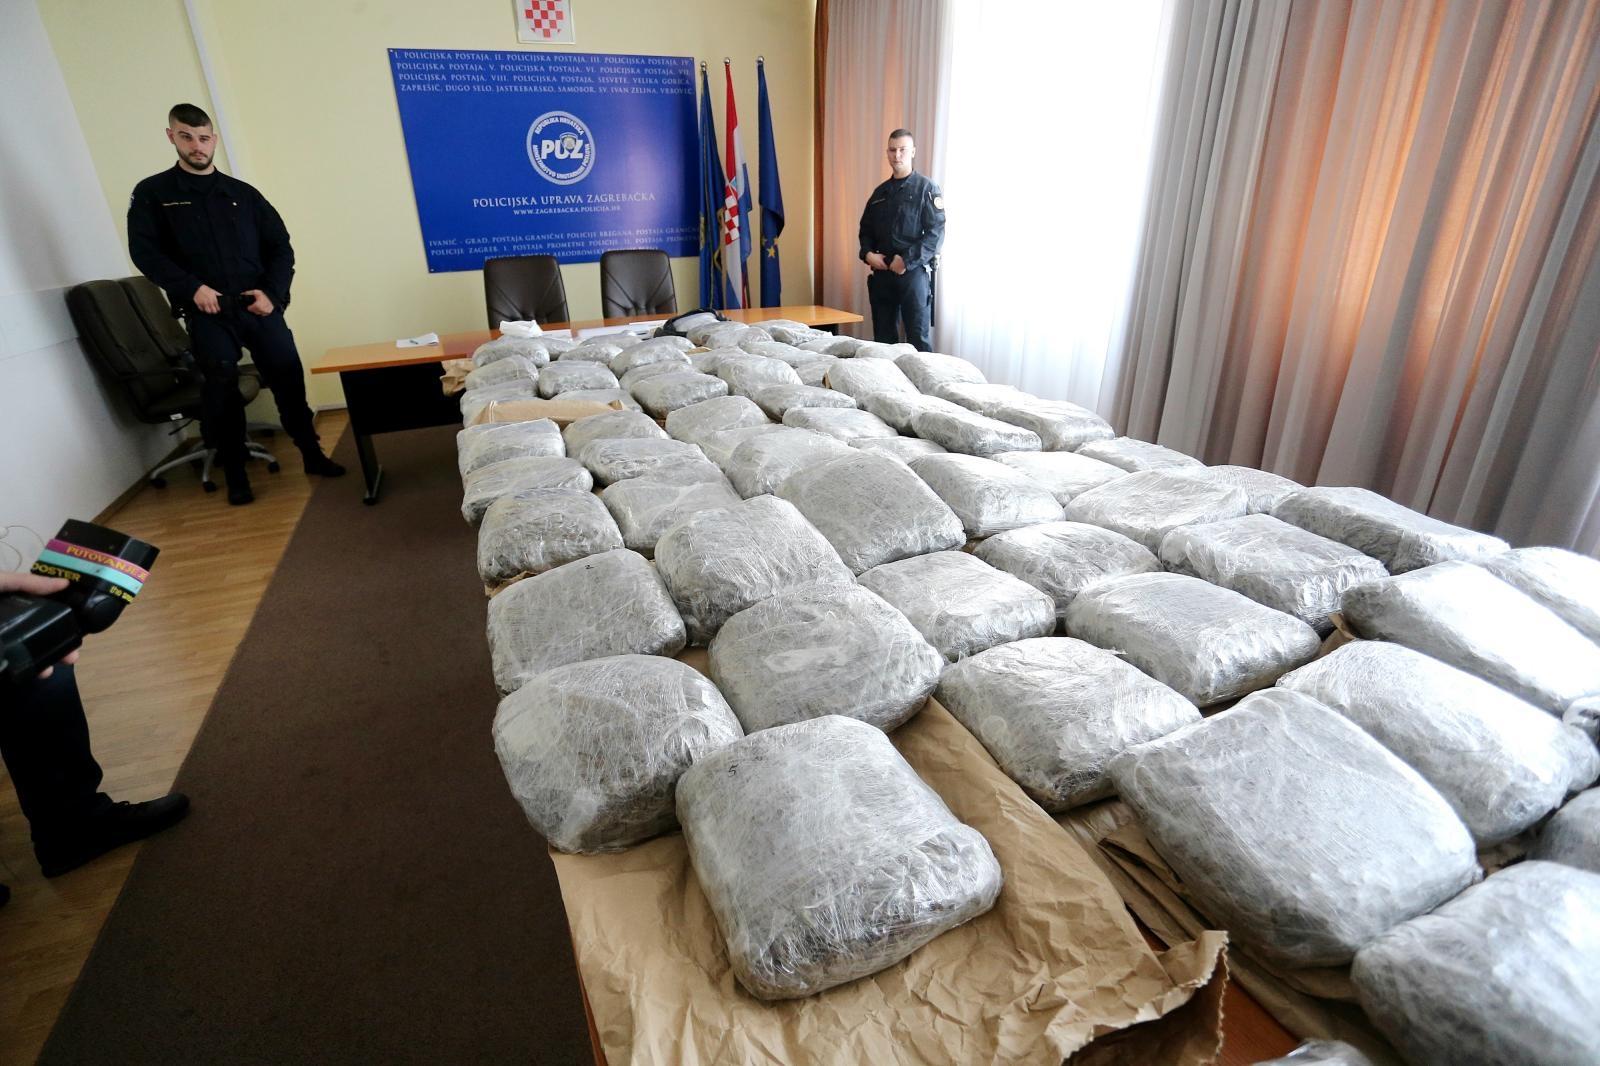 U Zagrebu zaplijenjeno oko 109 kilograma marihuane i preko 500 grama kokaina